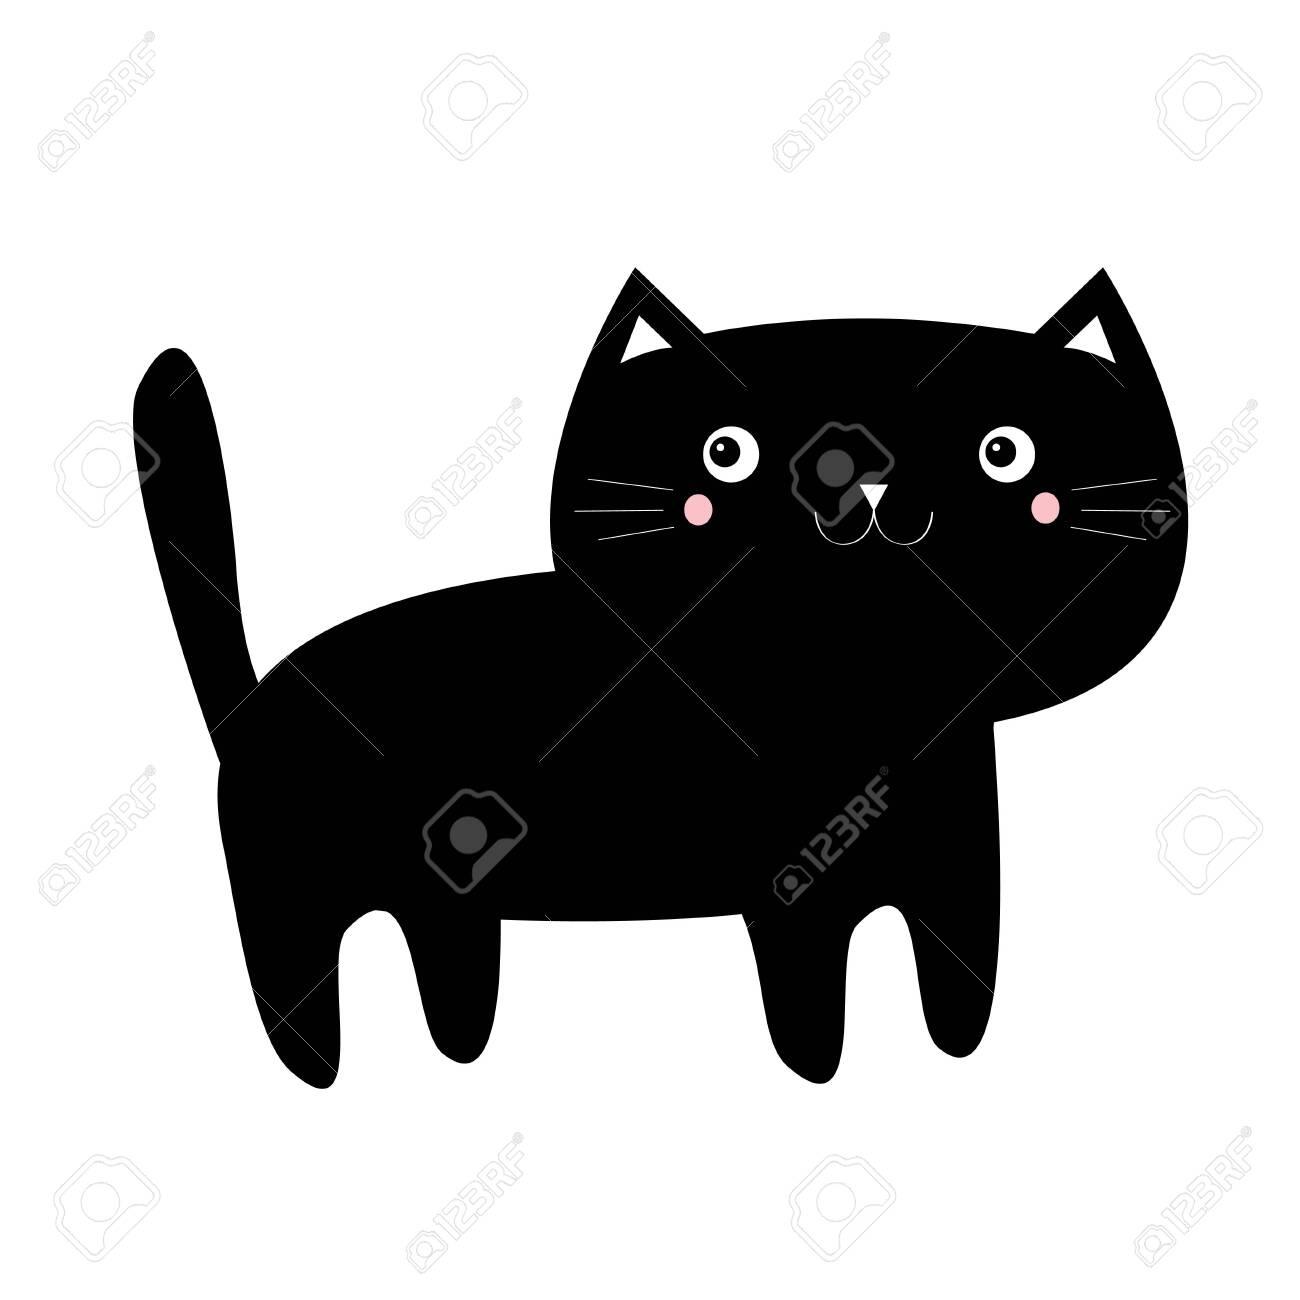 Black Cat Kitten Kitty Icon Funny Face Cute Kawaii Cartoon